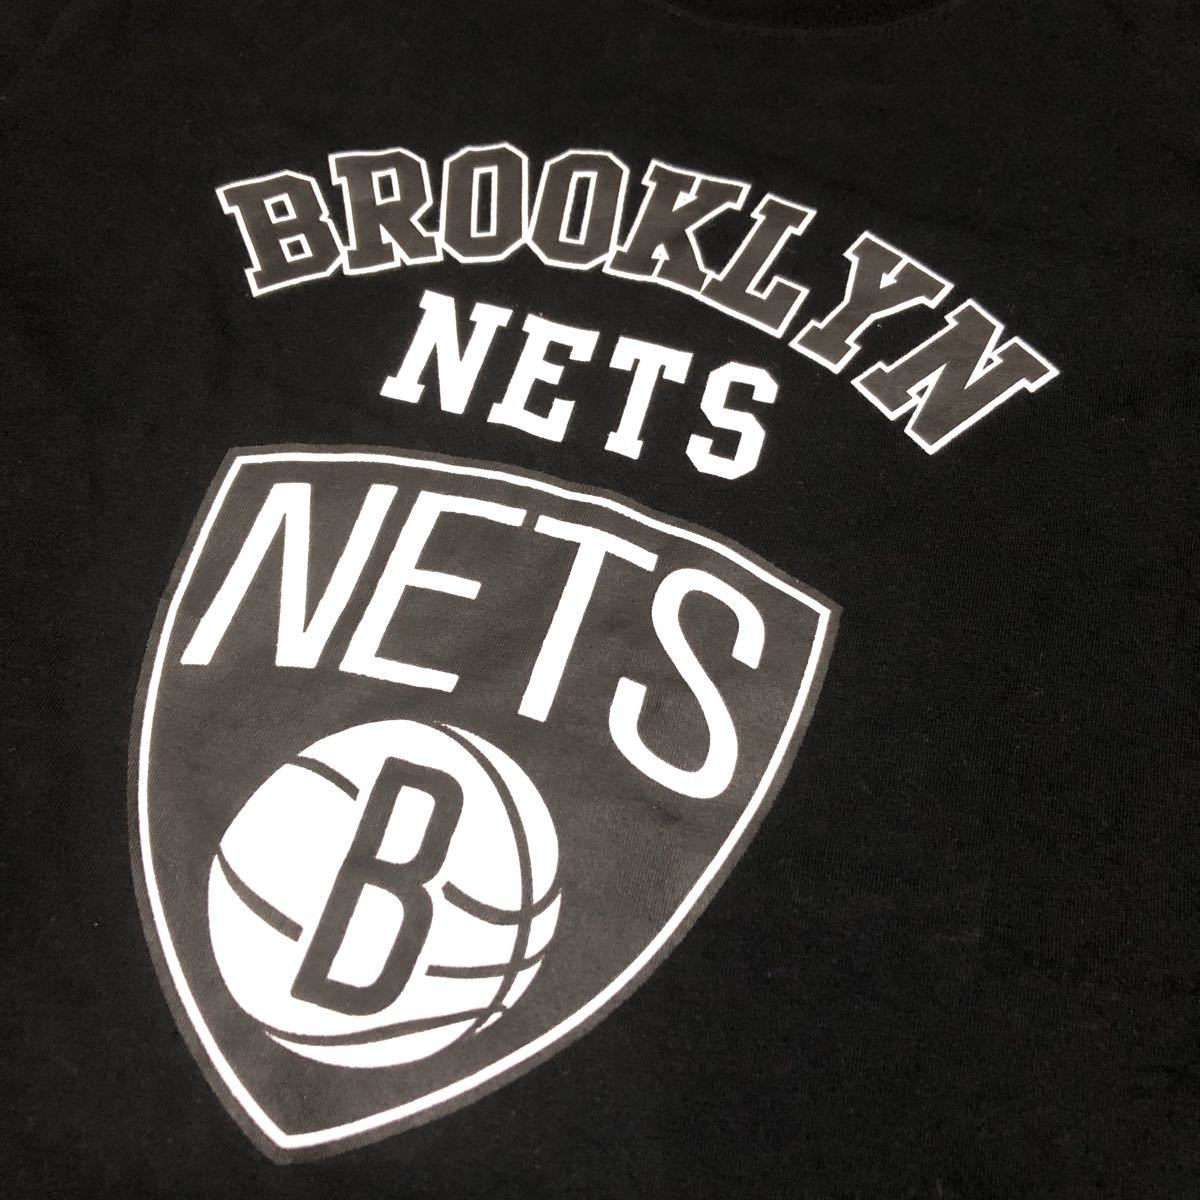 NBA Brooklyn Nets ブルックリン ネッツ Tシャツ メンズサイズM-L_画像5